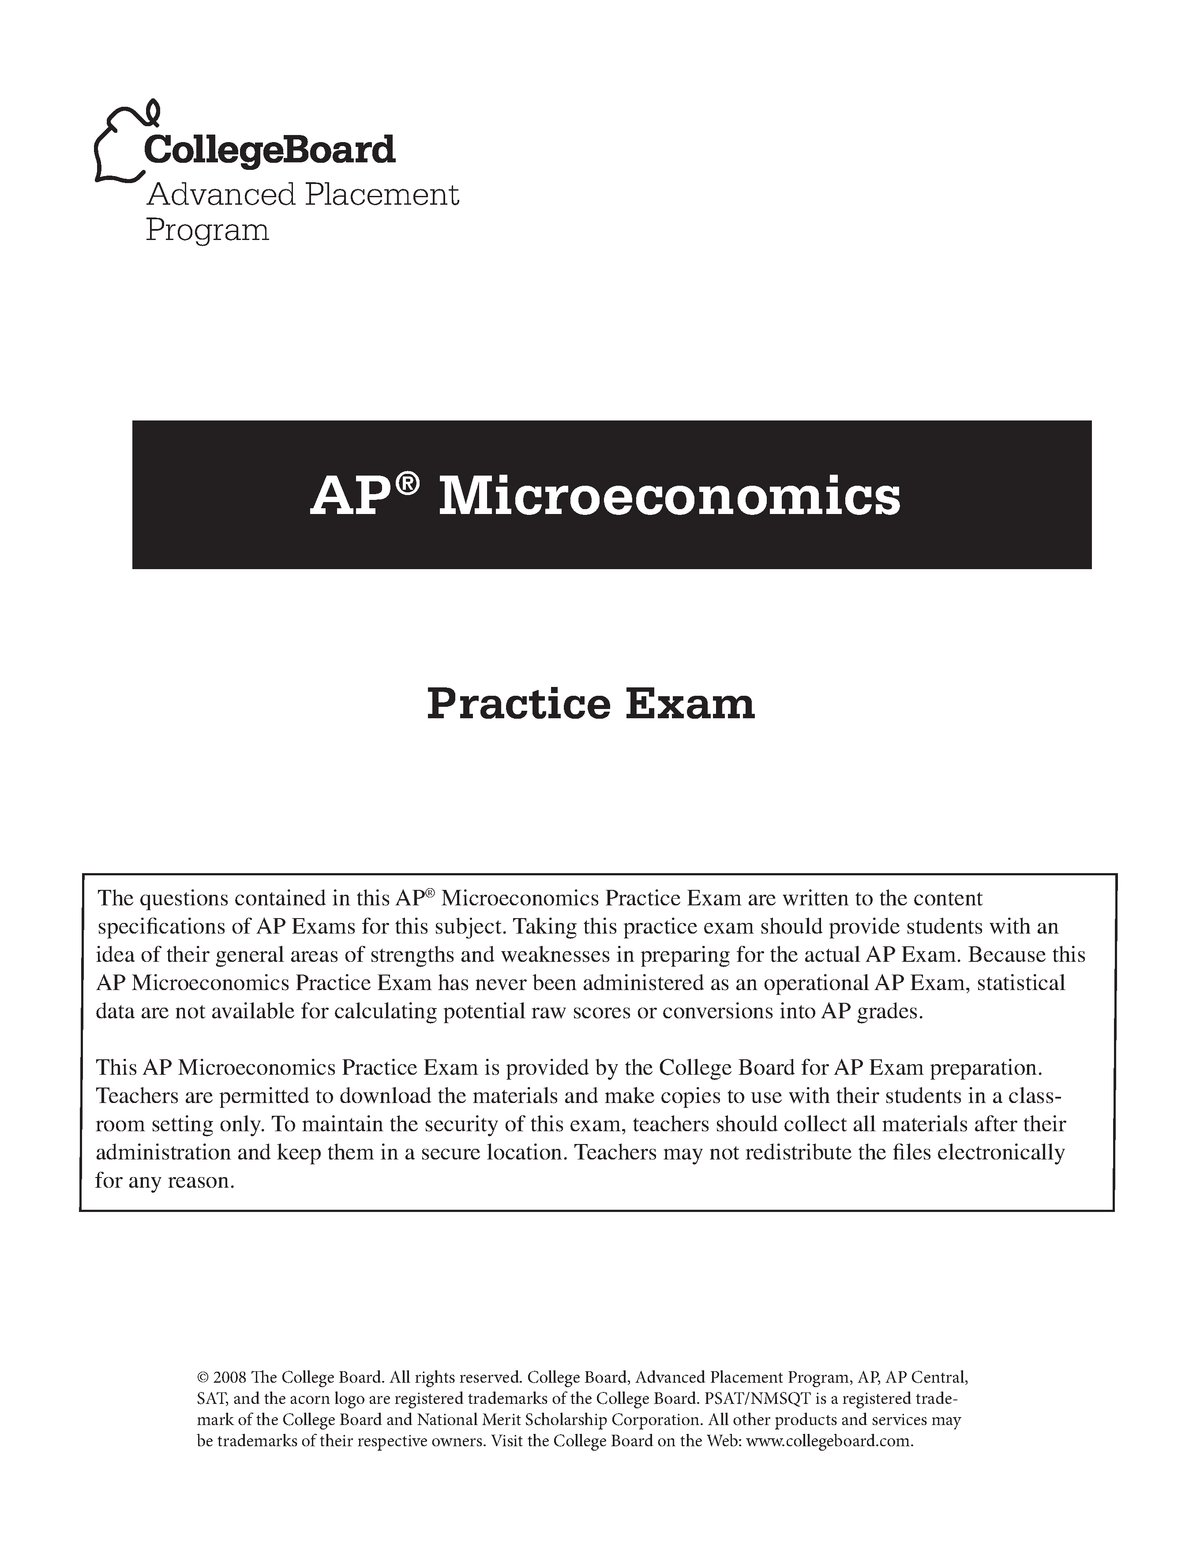 Exam 2016 - EC1002: Introduction to economics - StuDocu